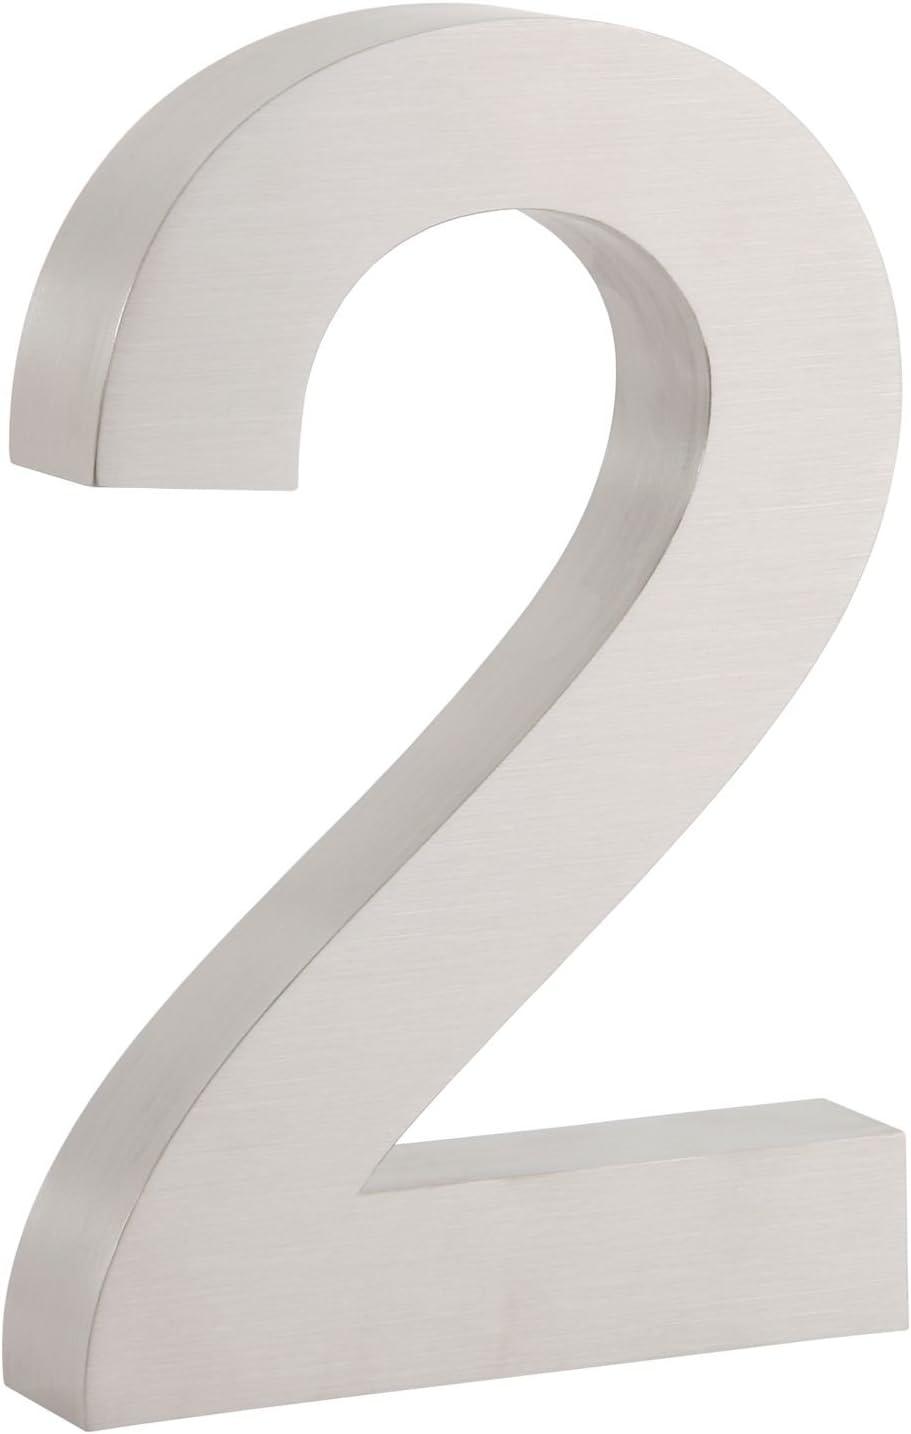 Verschiedene Zahlen zur Auswahl matt geb/ürstet Schrifttyp: Arial H 3 cm V2A Edelstahl 20 x Edelstahl Hausnummer T modernes 3D Design,